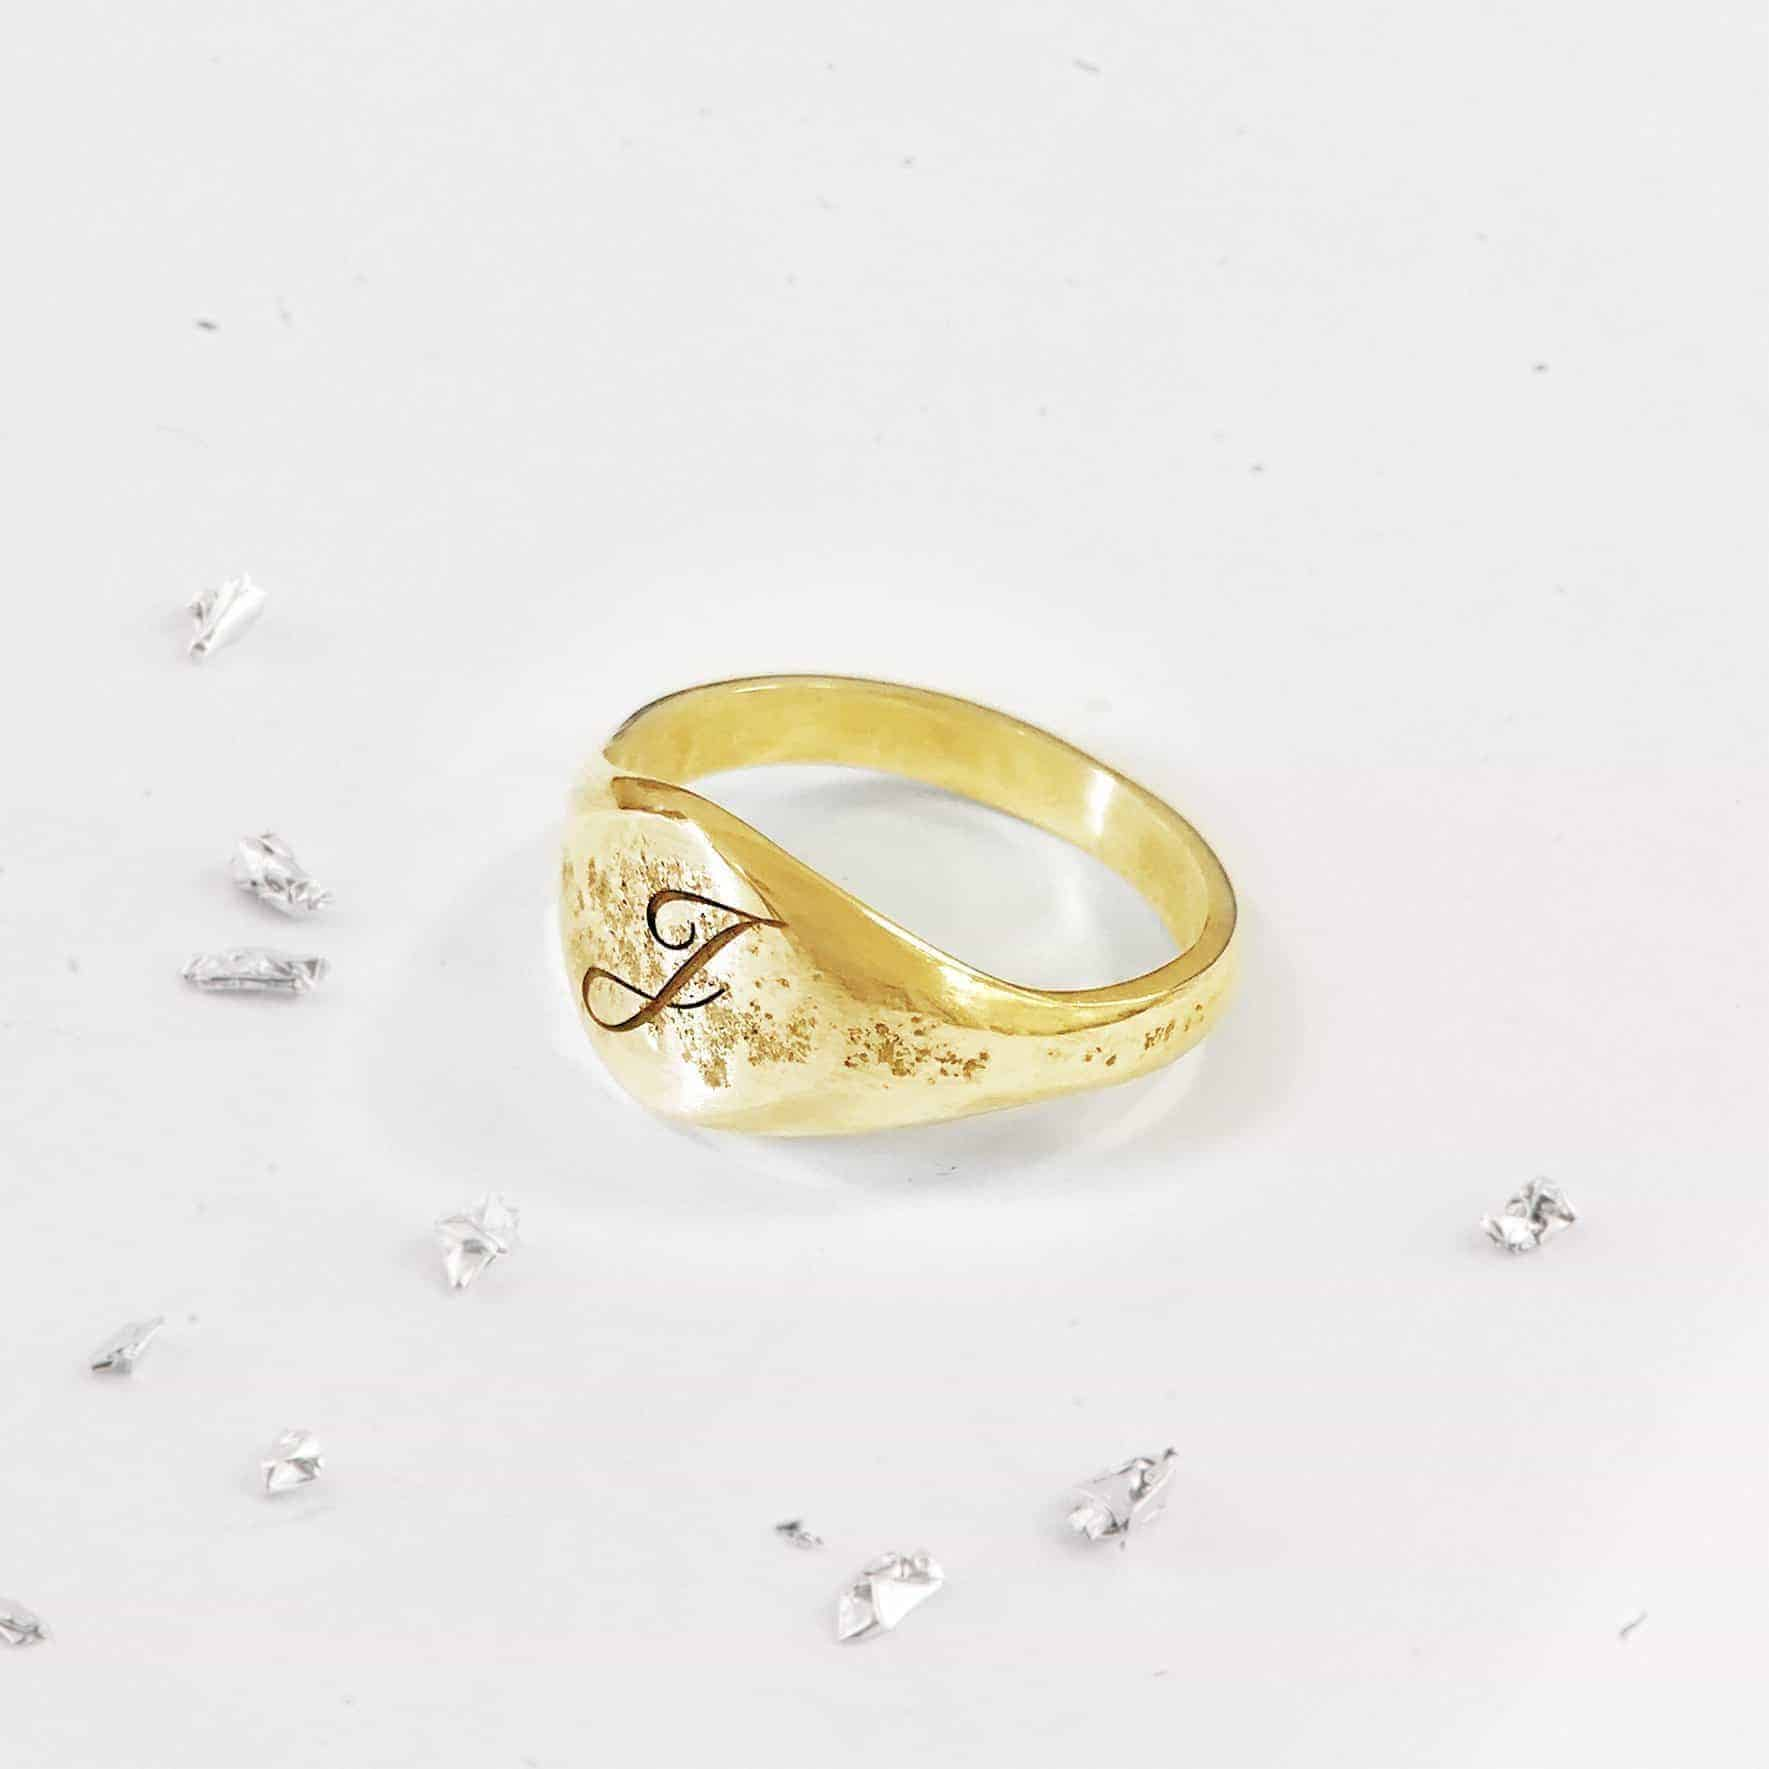 Yellow Gold Unisex Signet Ring